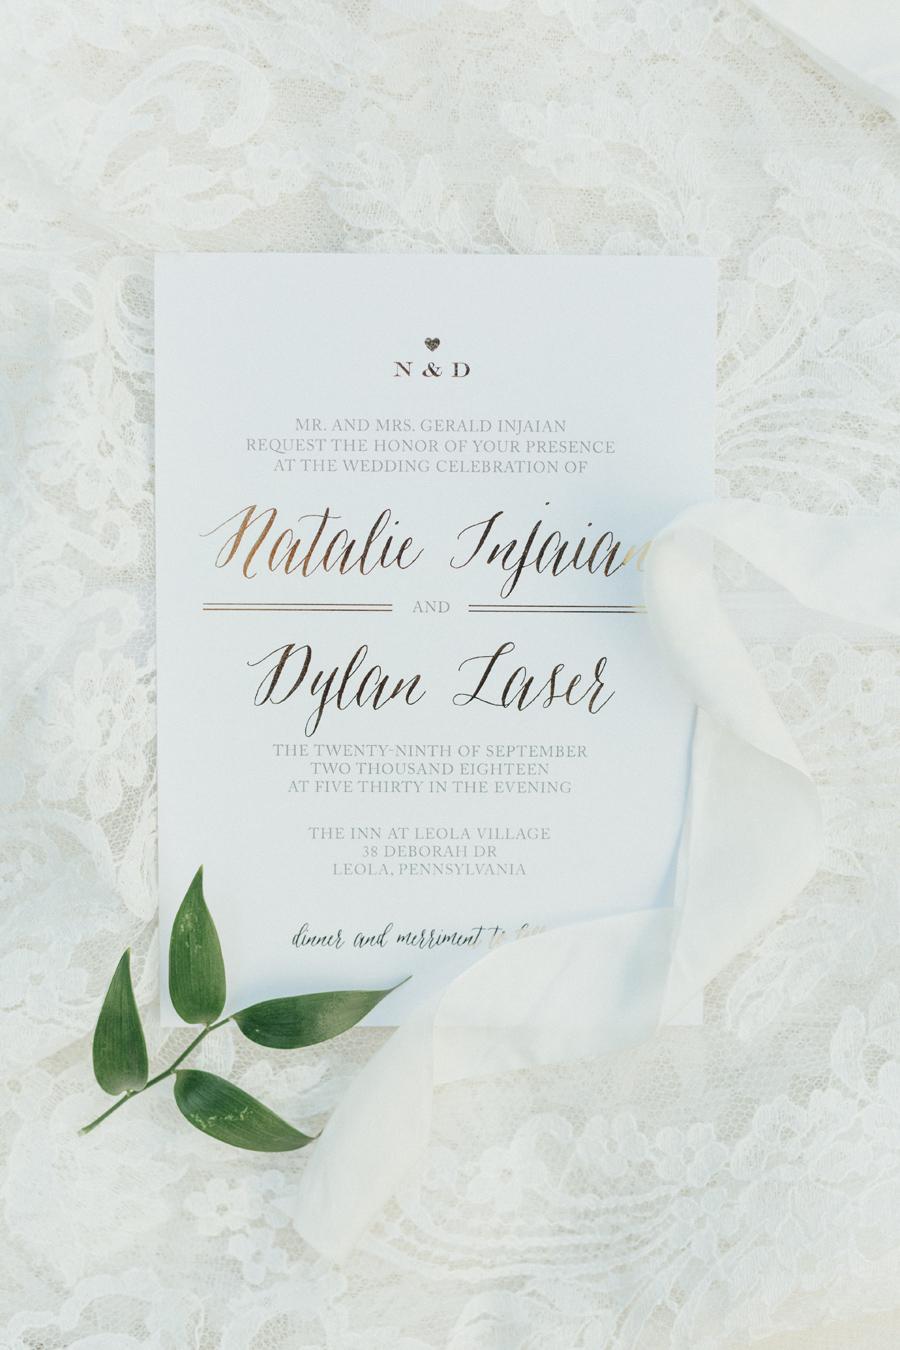 the-inn-at-leola-wedding-lancaster-pennsylvania-wedding-photographer-rebeka-viola-photograhy (4).jpg